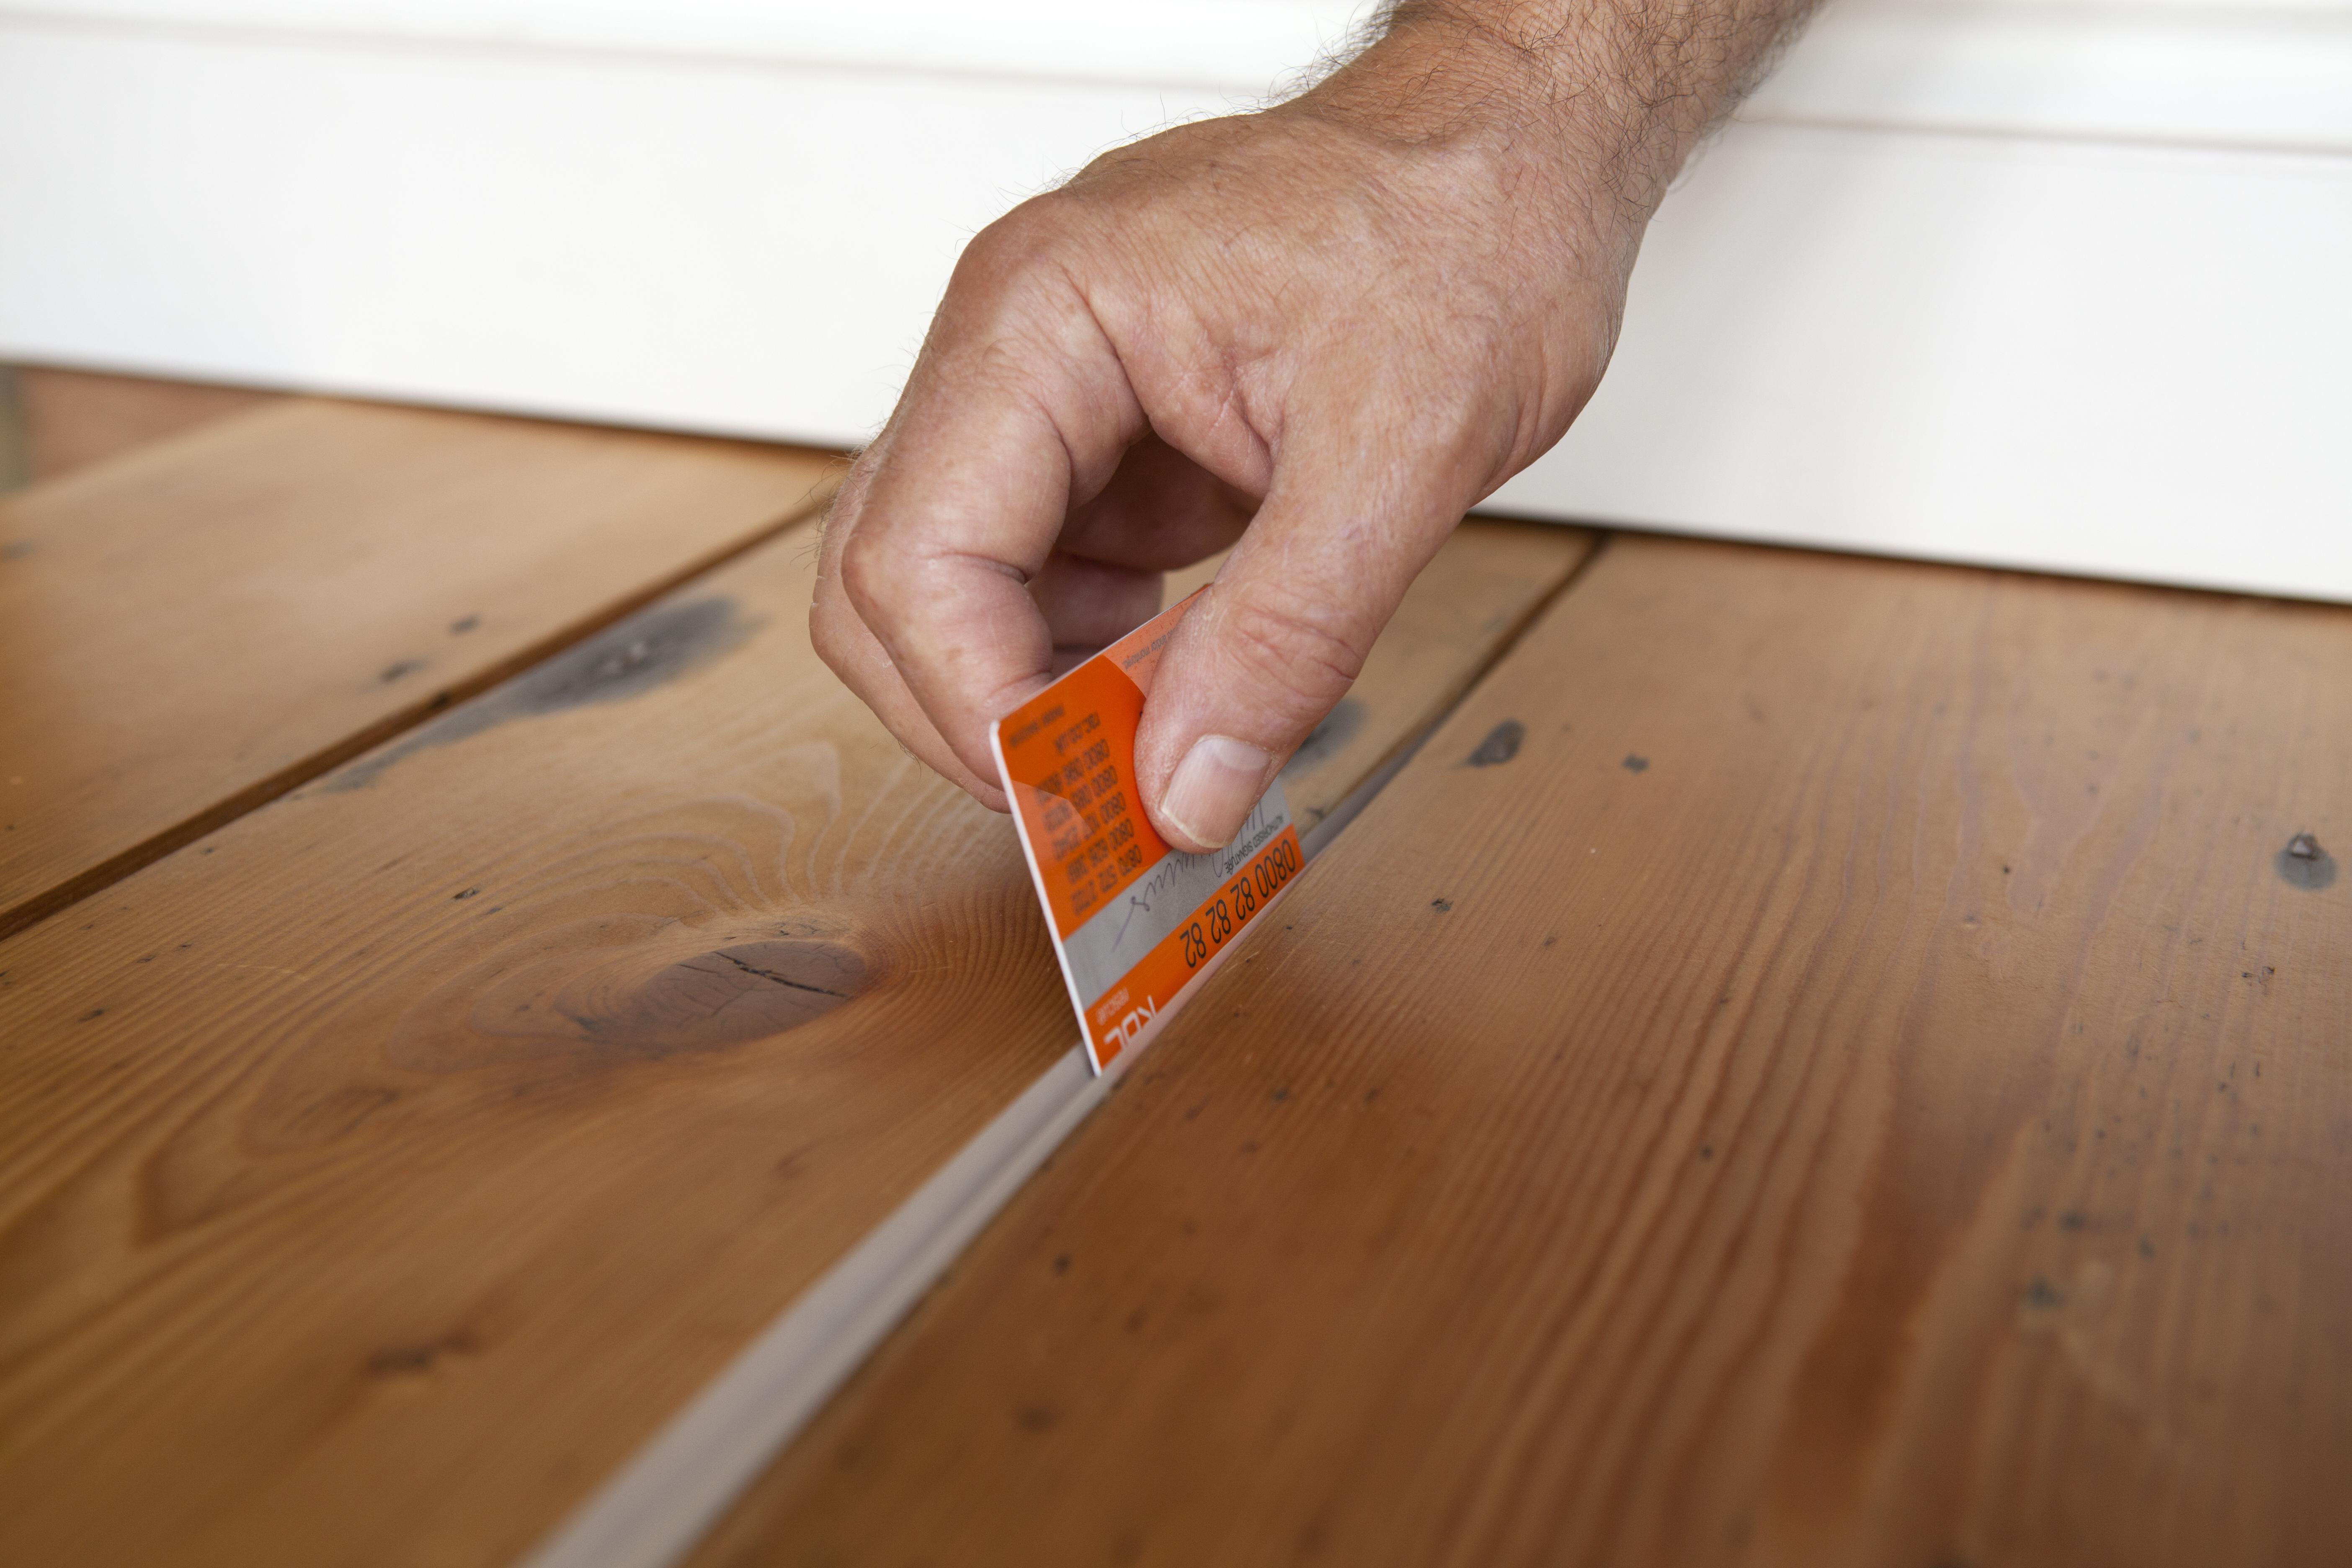 Filling Gaps In Floorboards With Stopgap